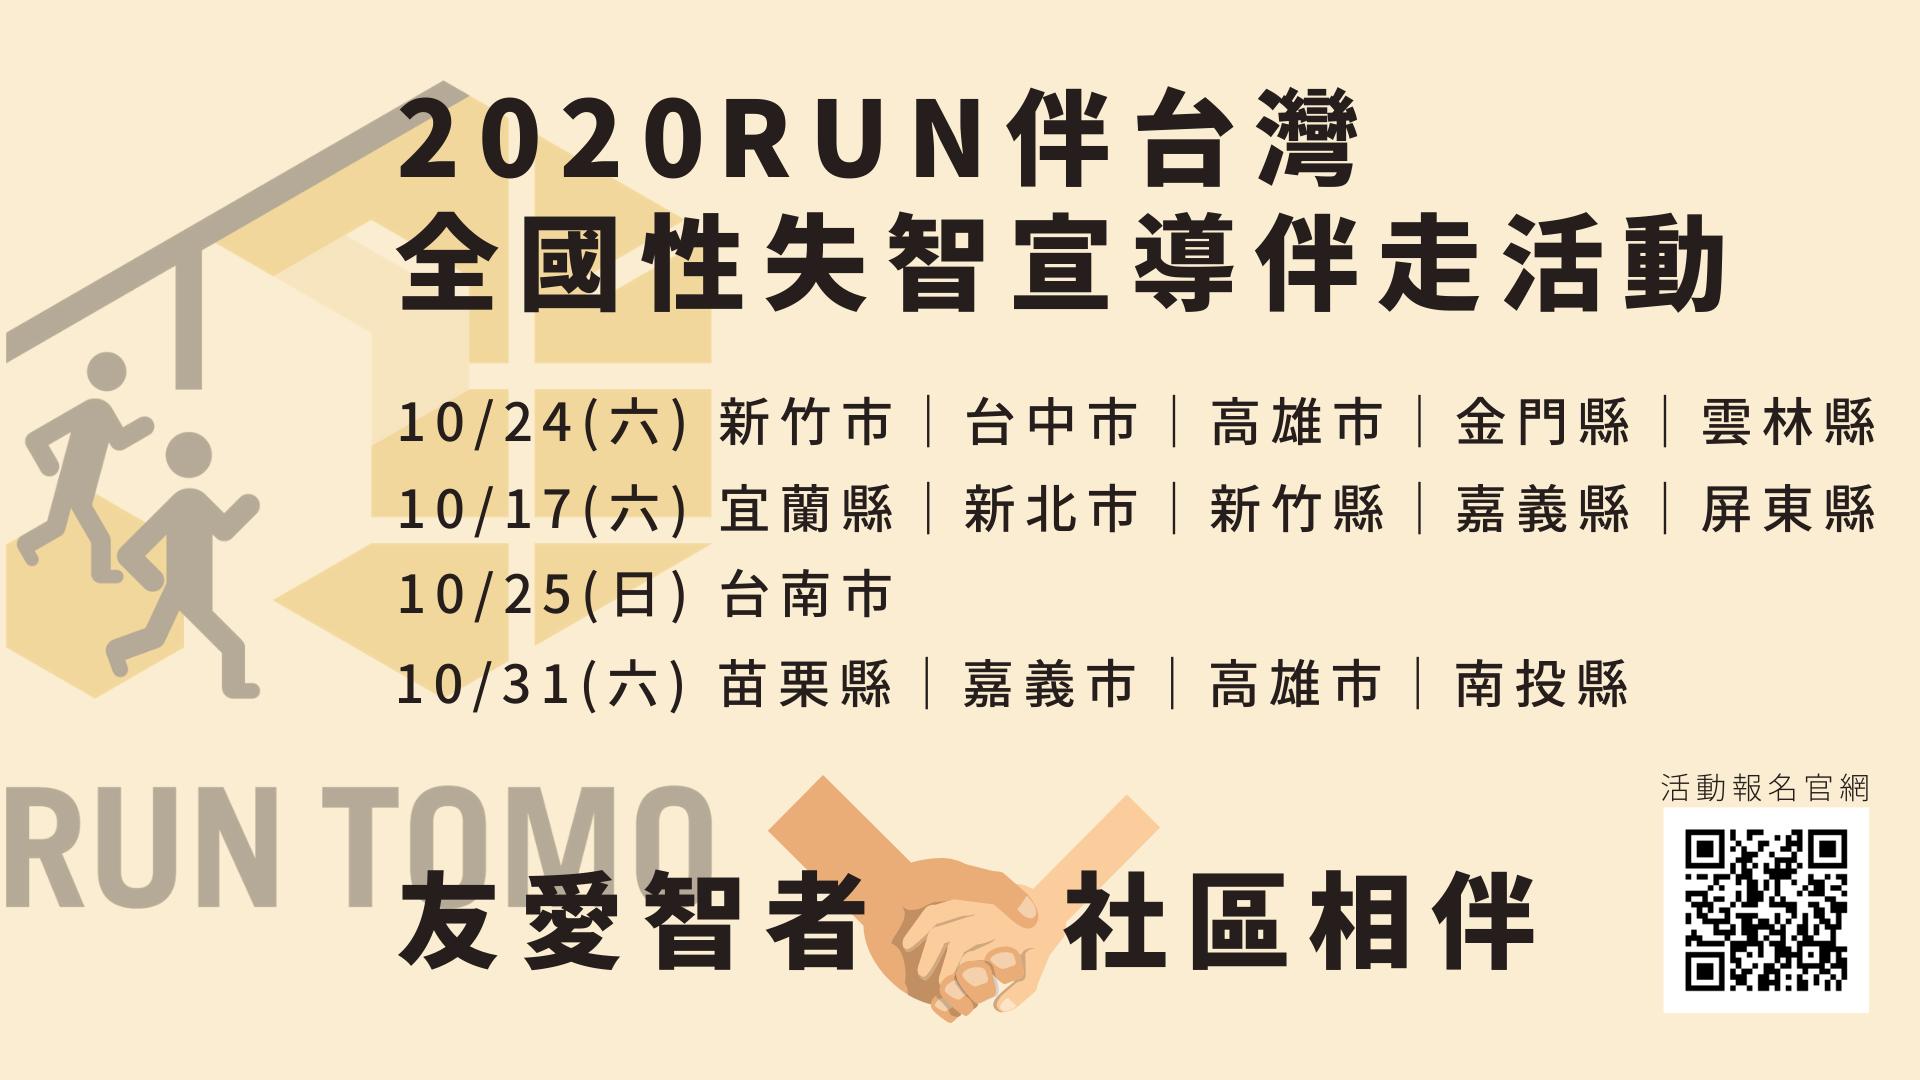 2020 RUN伴台灣|全國性失智宣導伴走活動